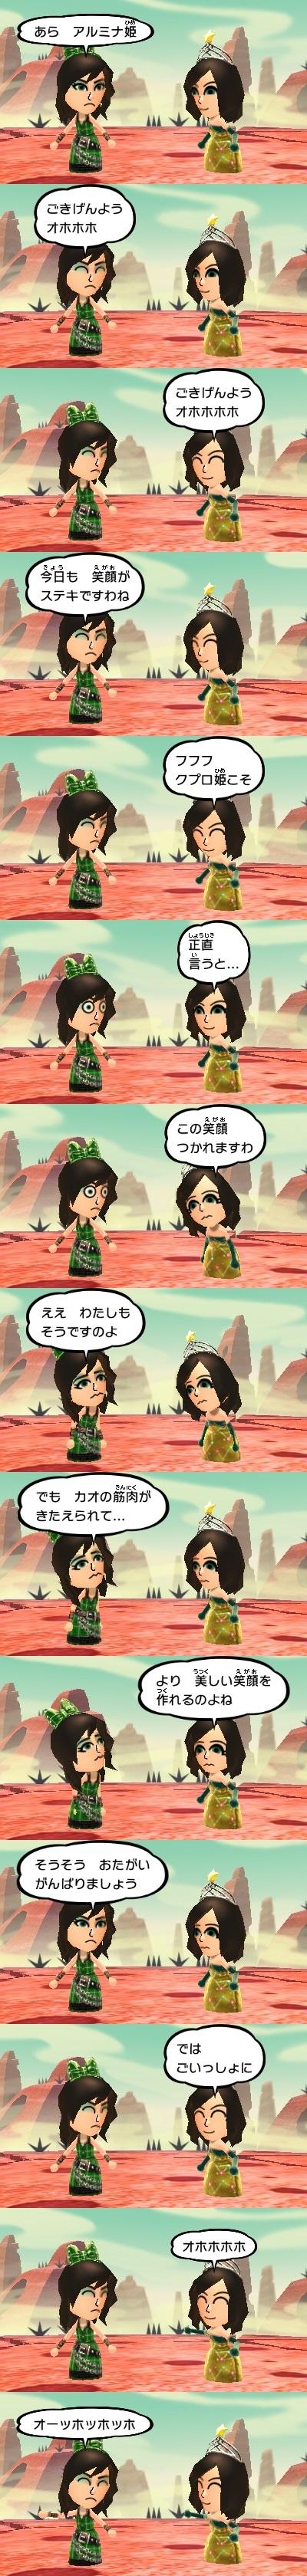 Miitopia_PrincessS.jpg